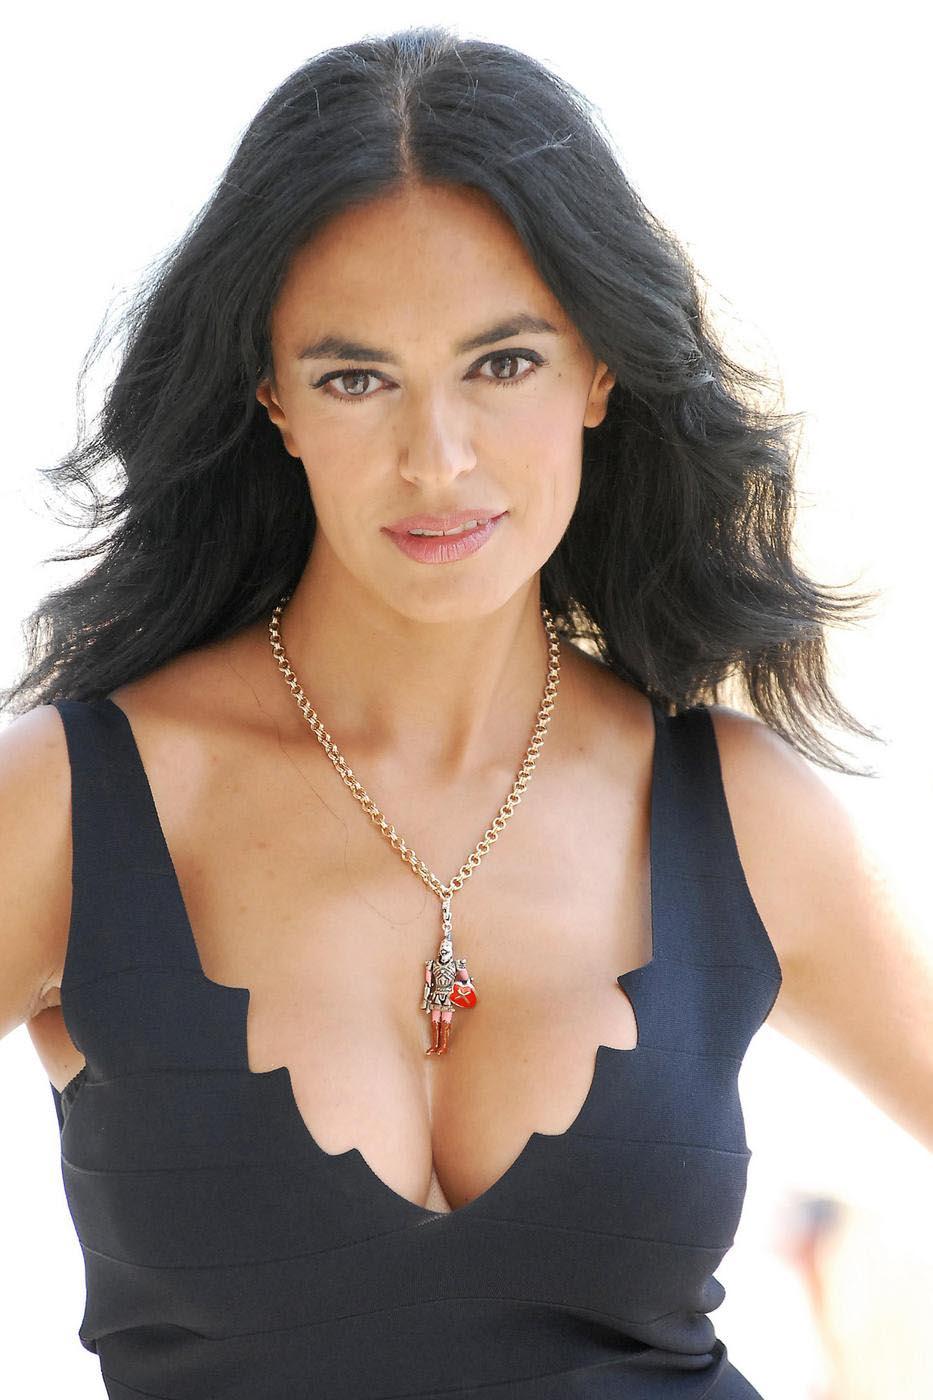 Linda Hogan (TV personality),Jean Harlow Porno tube Leslie Easterbrook born July 29, 1949 (age 69),Subhasree Ganguly